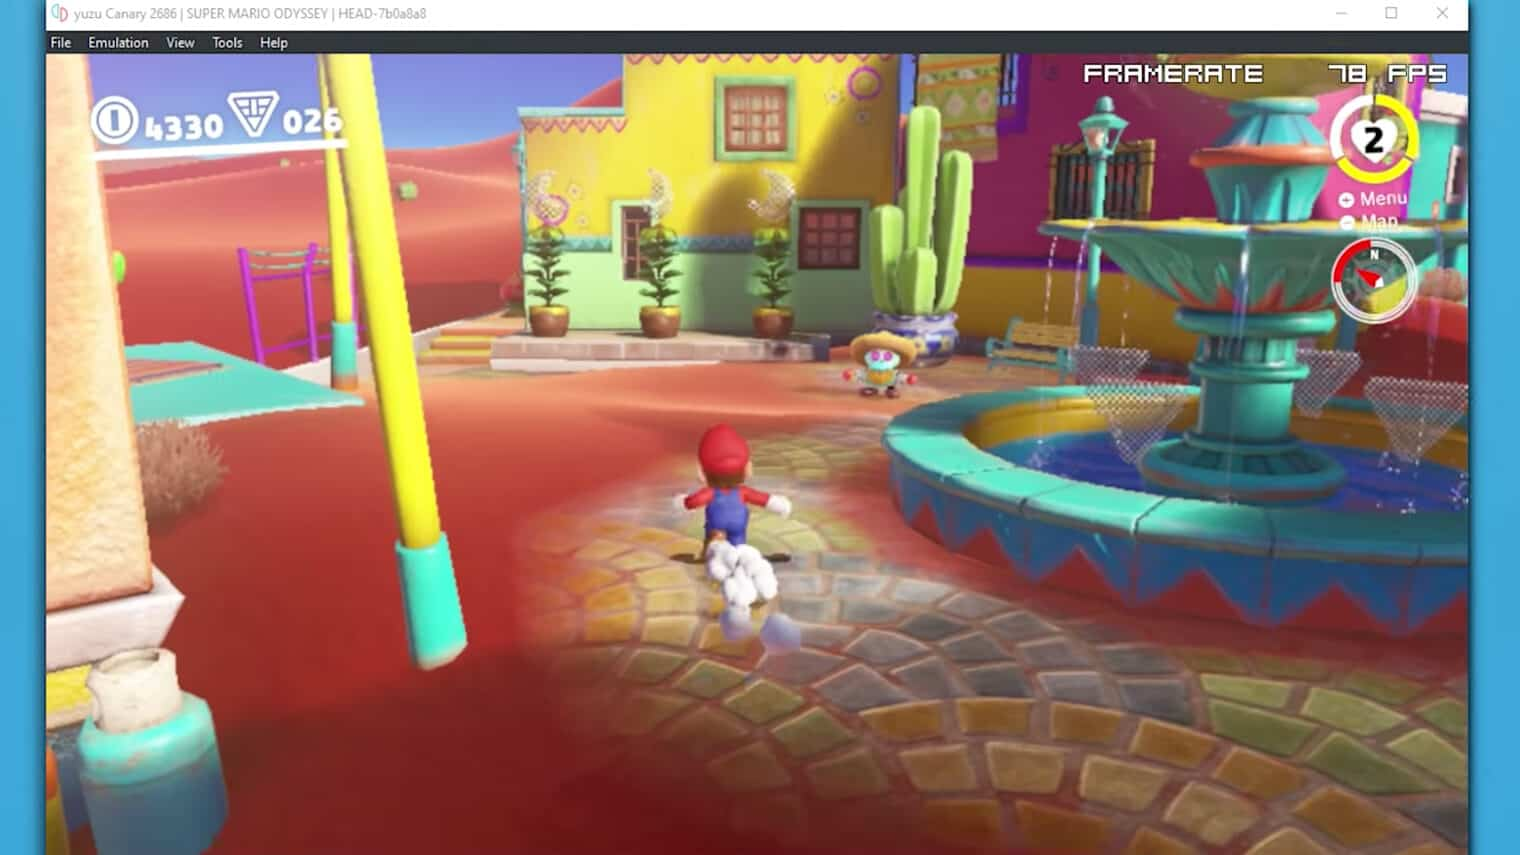 Yuzu - Best Nintendo Switch Emulator